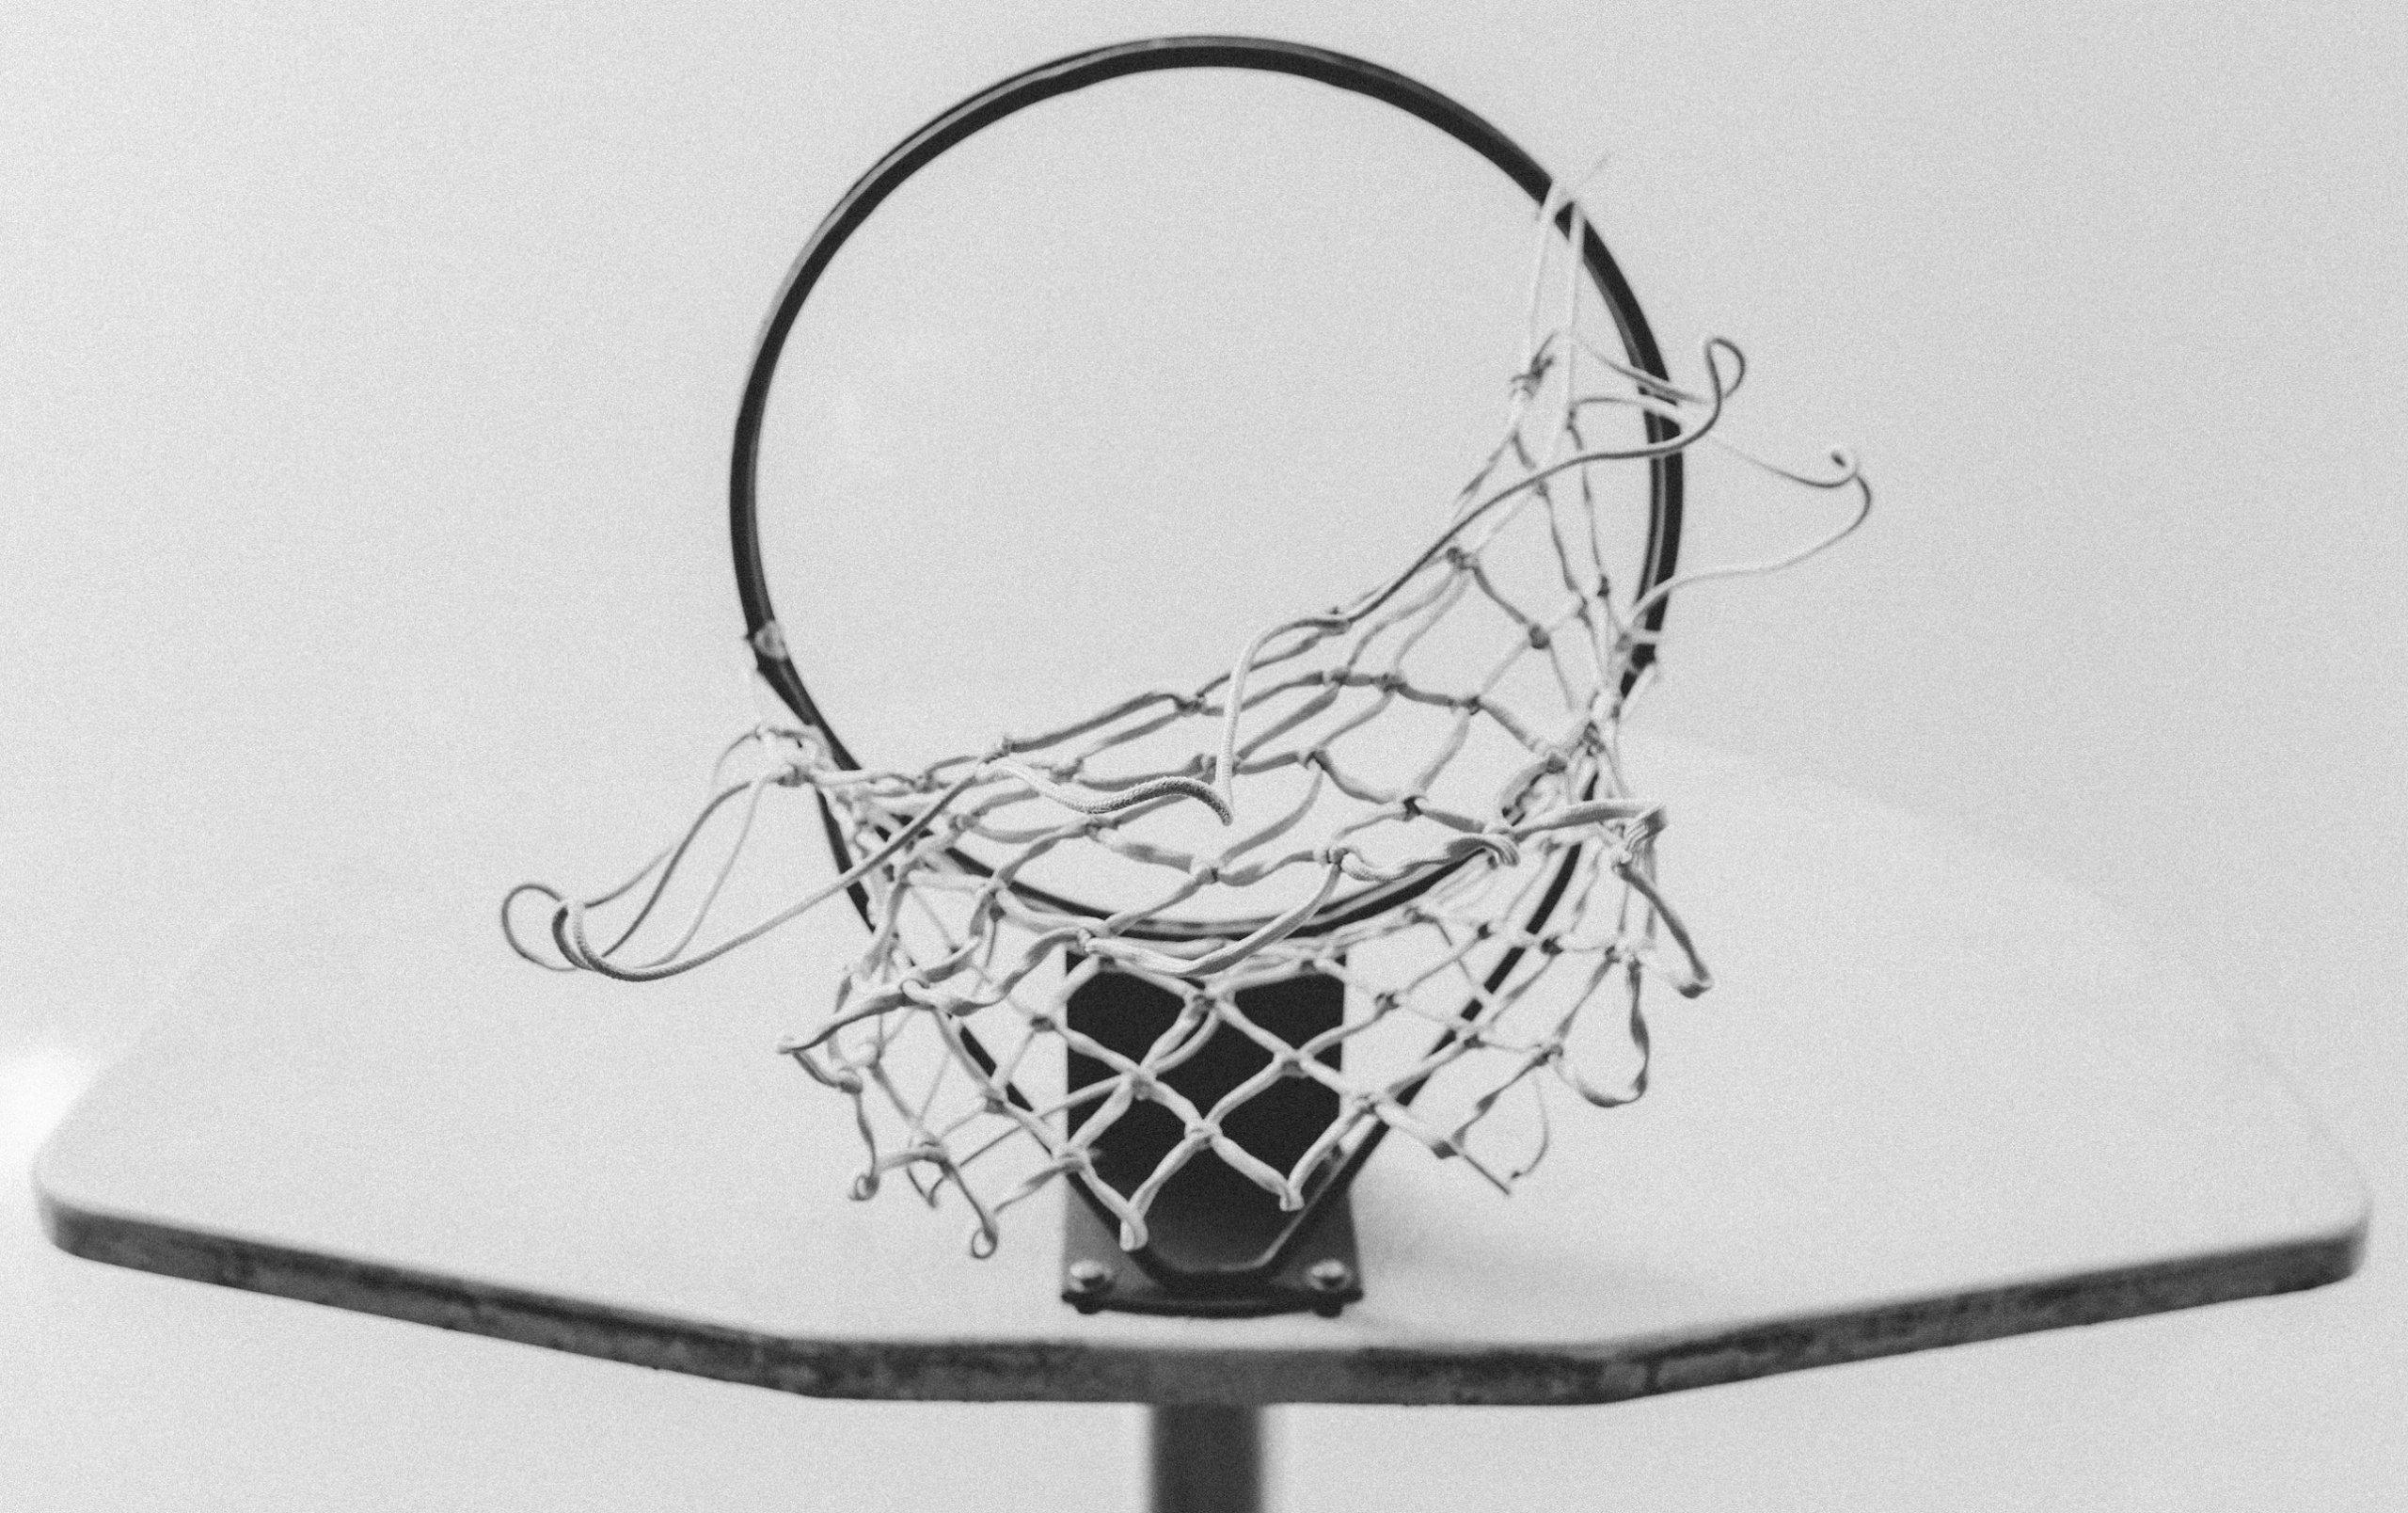 red rota baloncesto